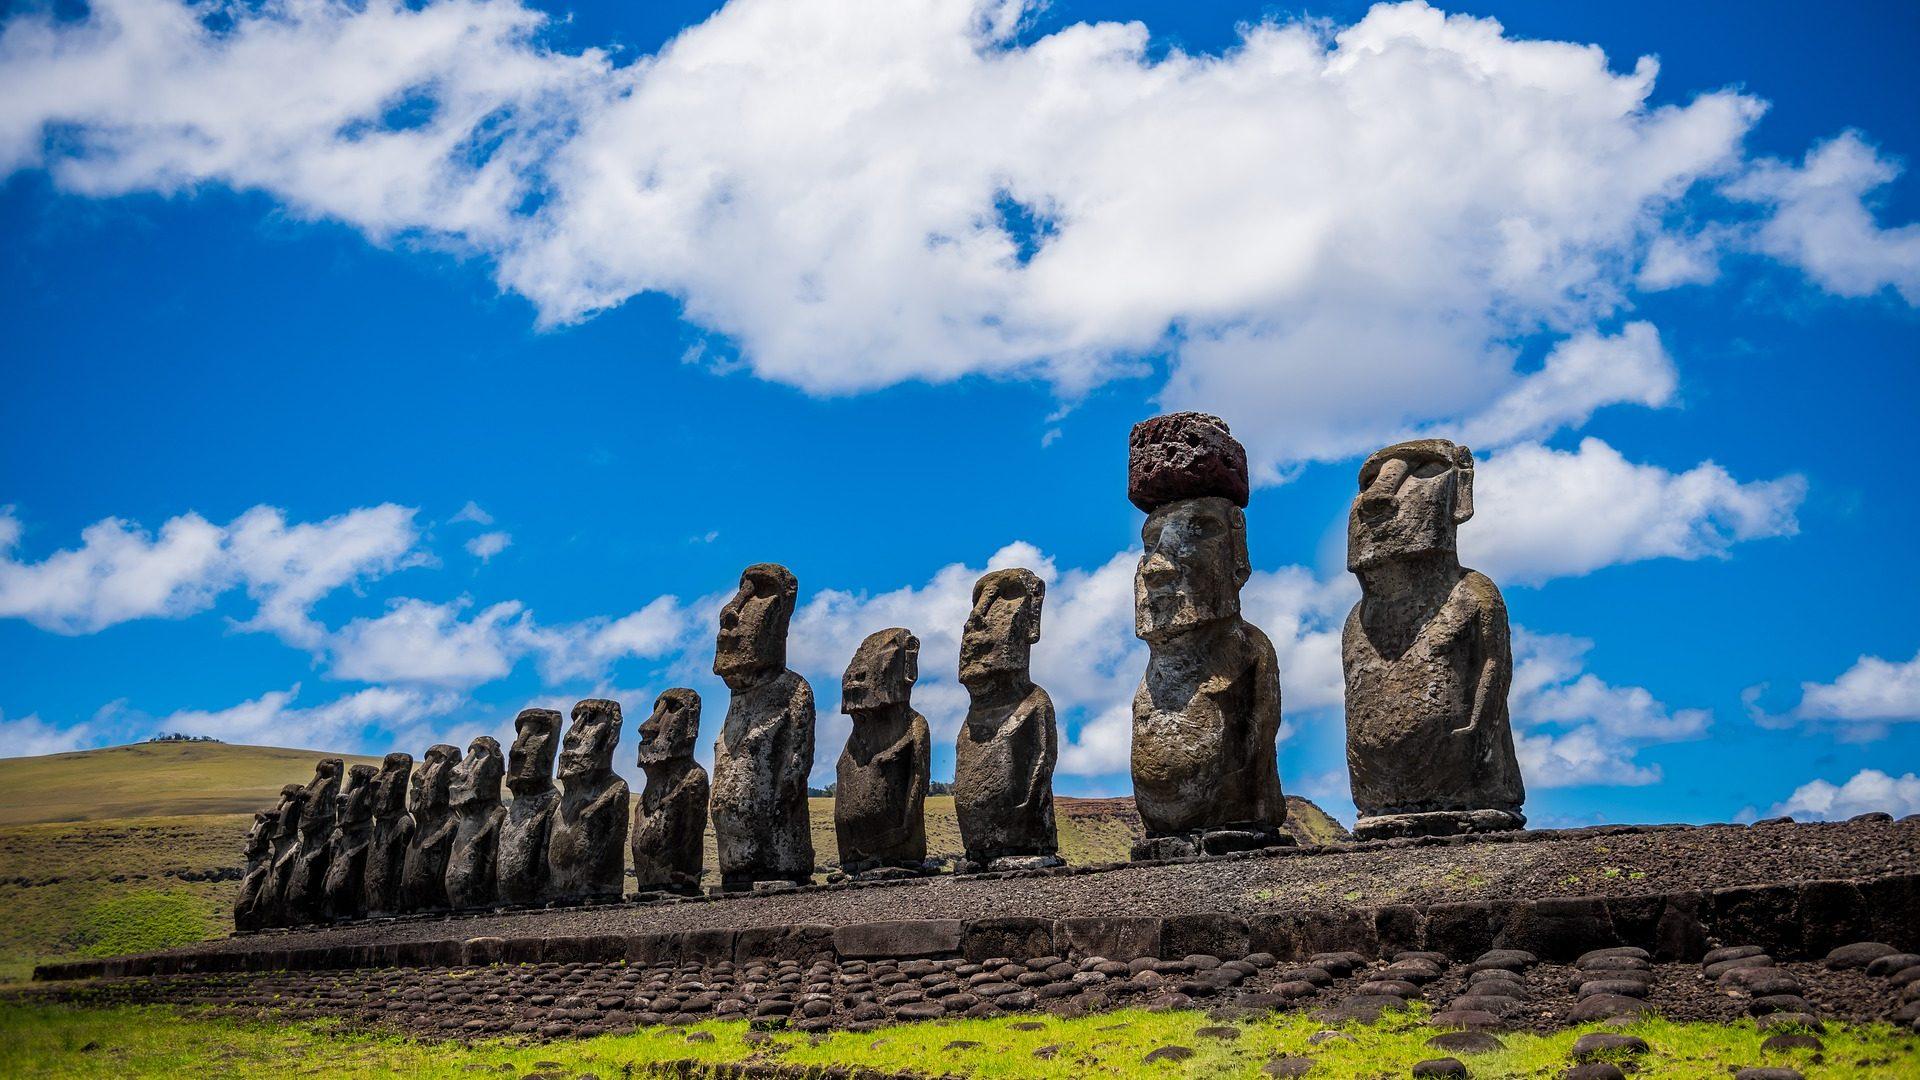 Image: A line of Moai statues on Rapa Nui also called Easter Island